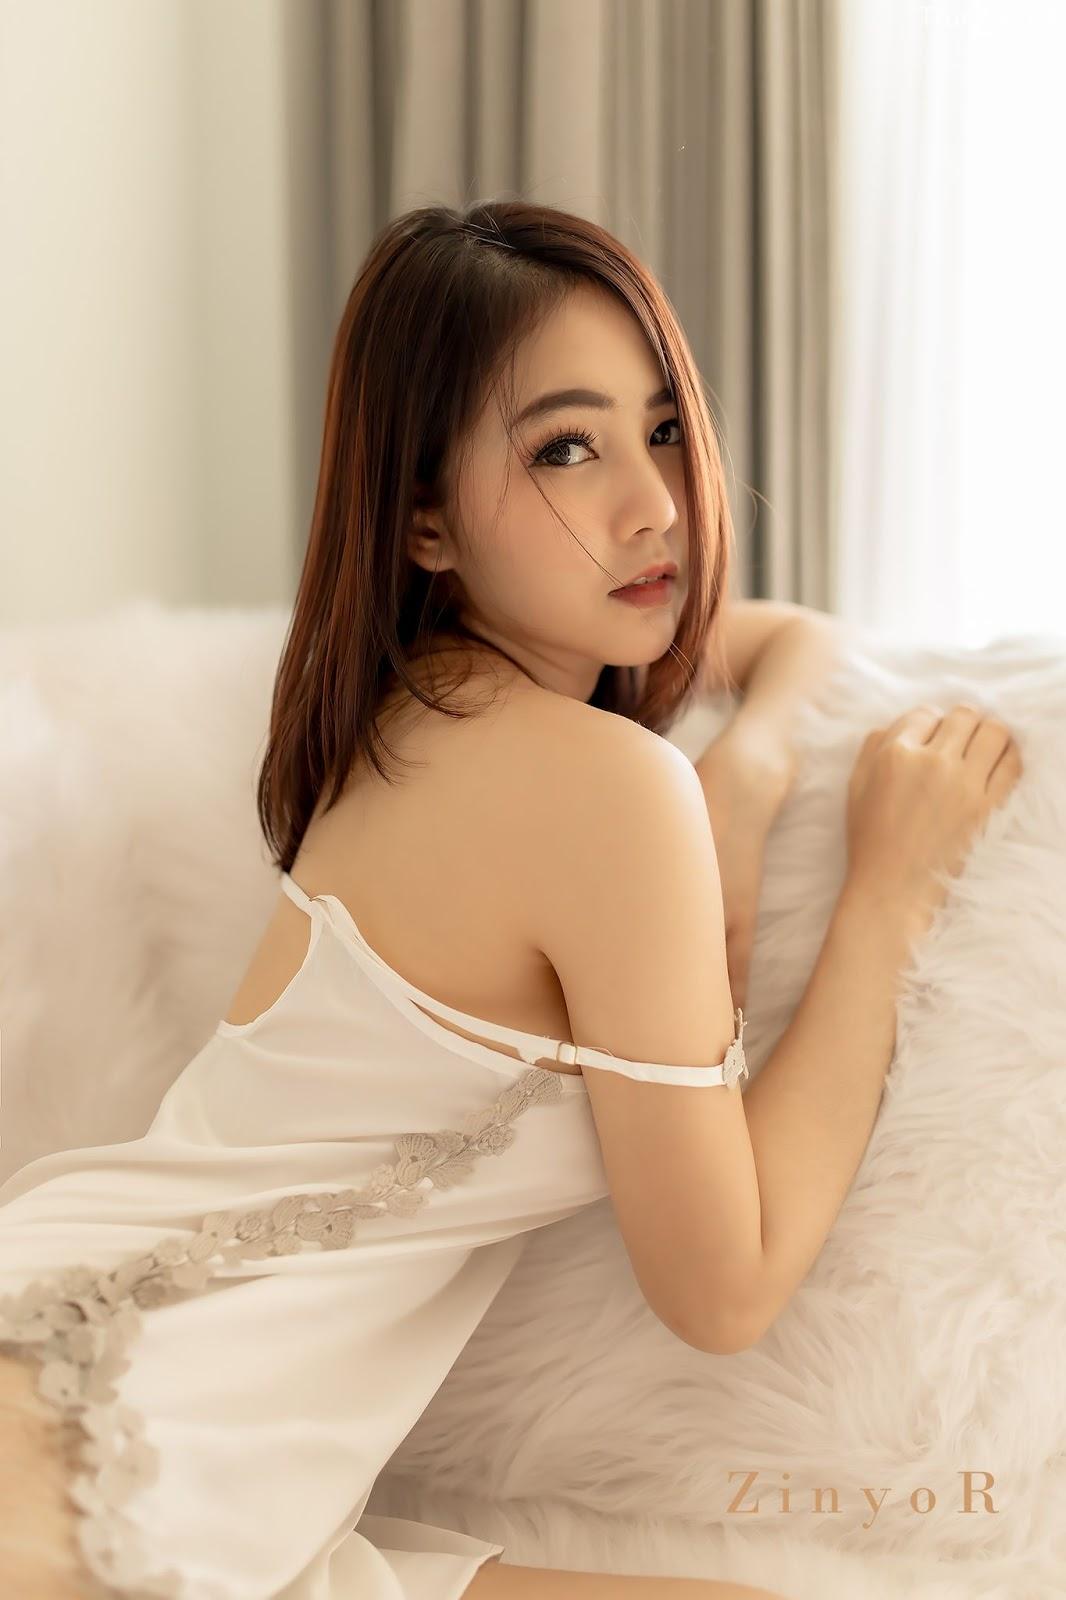 Thailand sexy models - Pattamaporn Keawkum & Mind Varunrapat & Phitchamol Srijantanet - Concept : Thailand victoria's secret - Picture 3